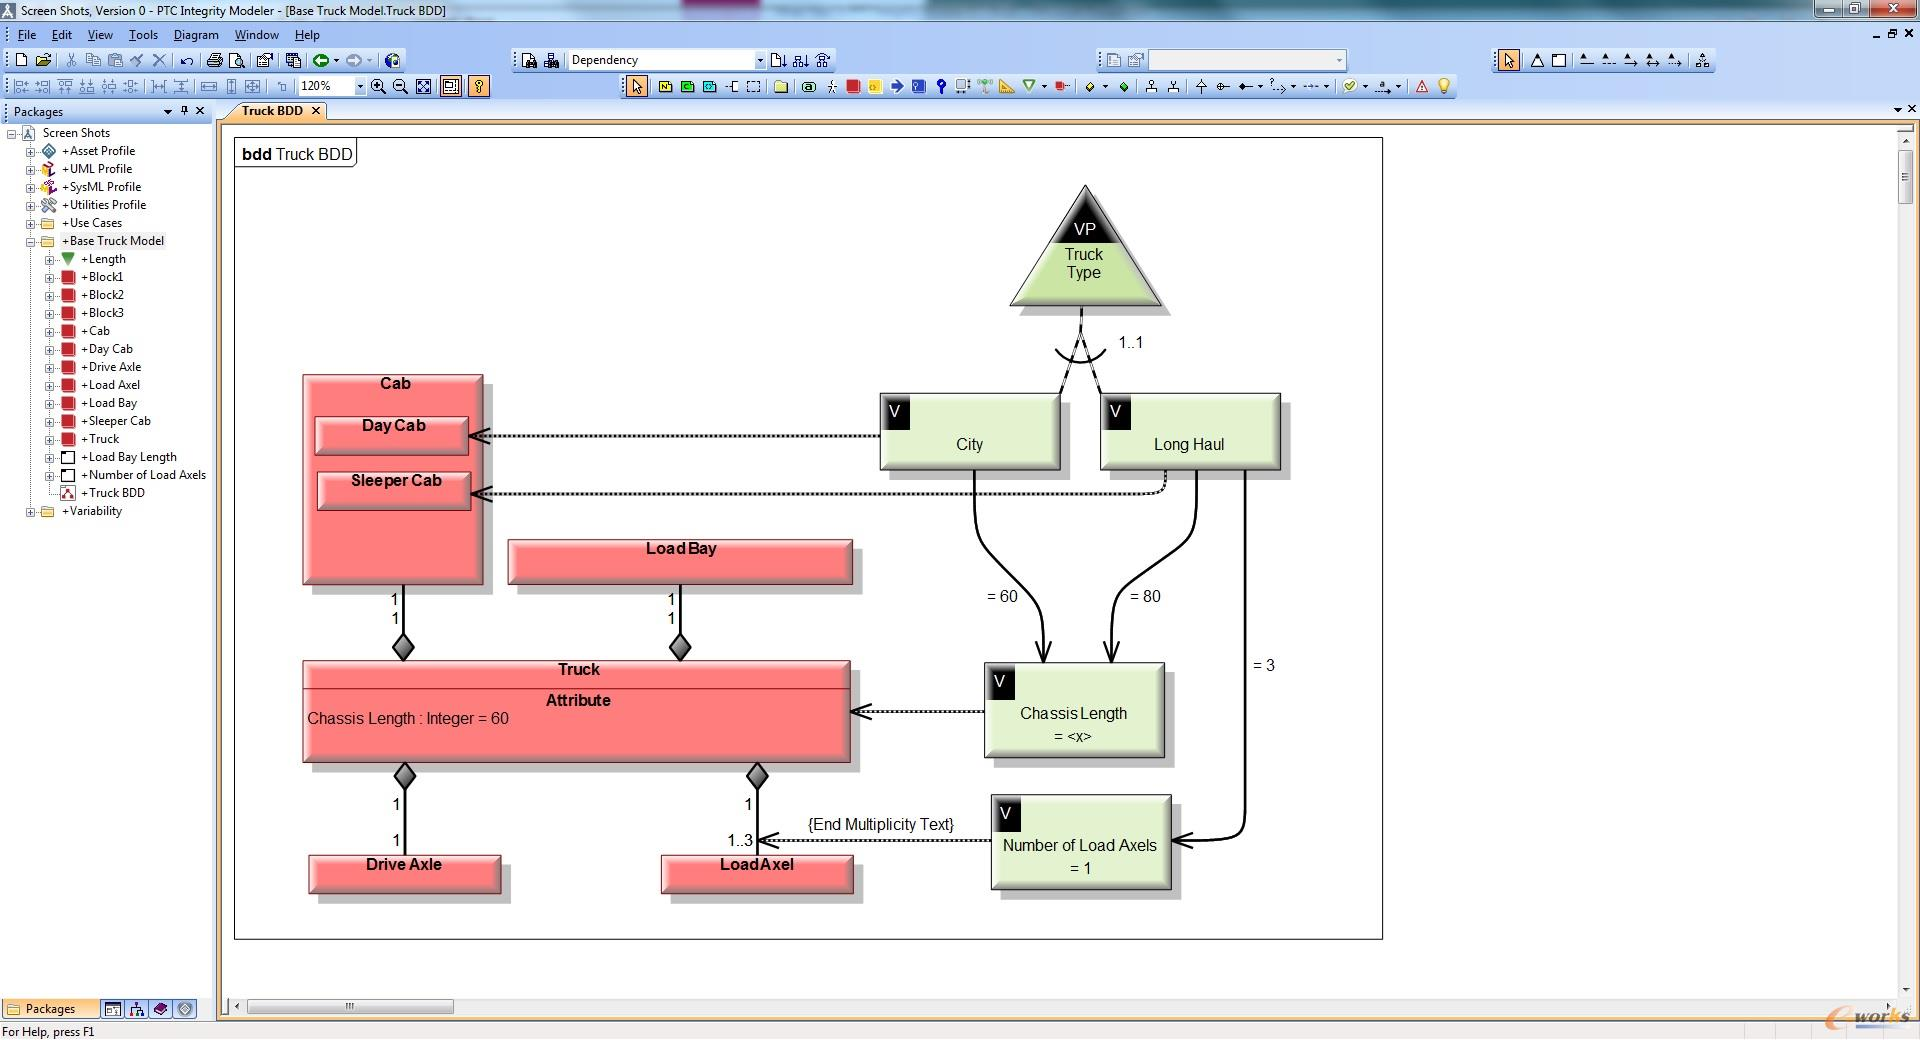 PTC Integrity建模器为产品线工程提供业界首创的可变参数